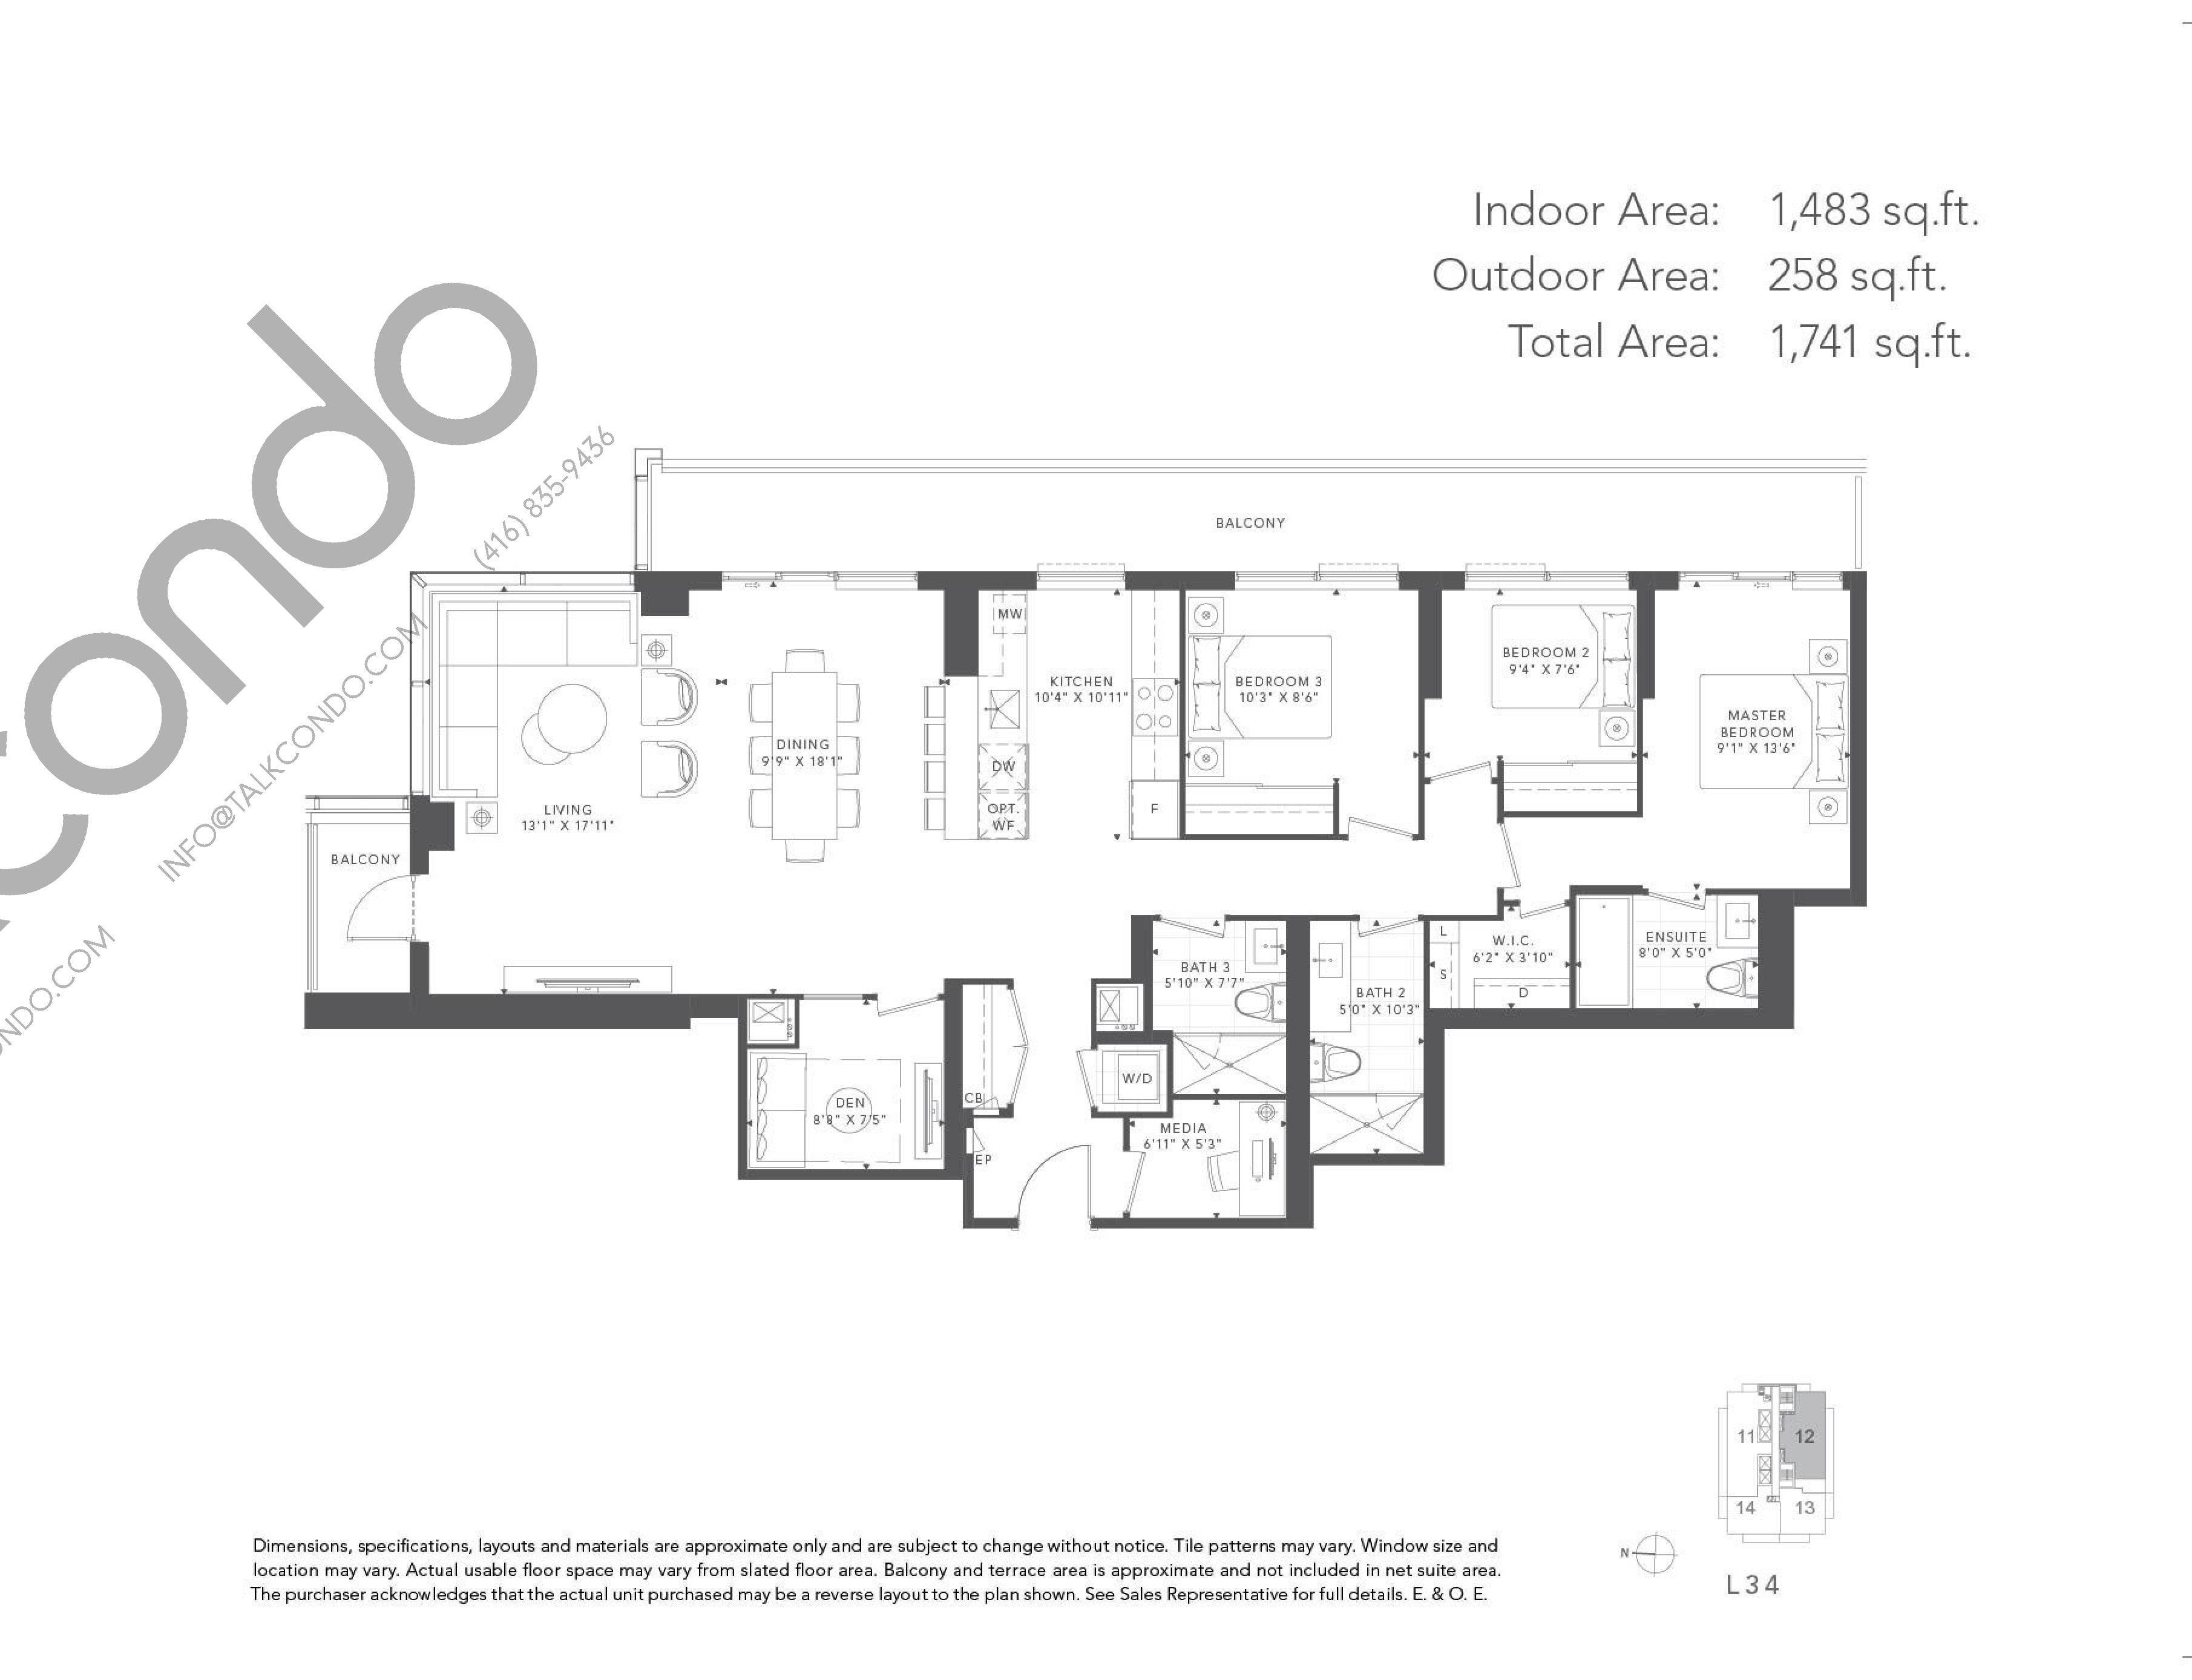 Hazel Floor Plan at T1 at M2M Condos - 1483 sq.ft